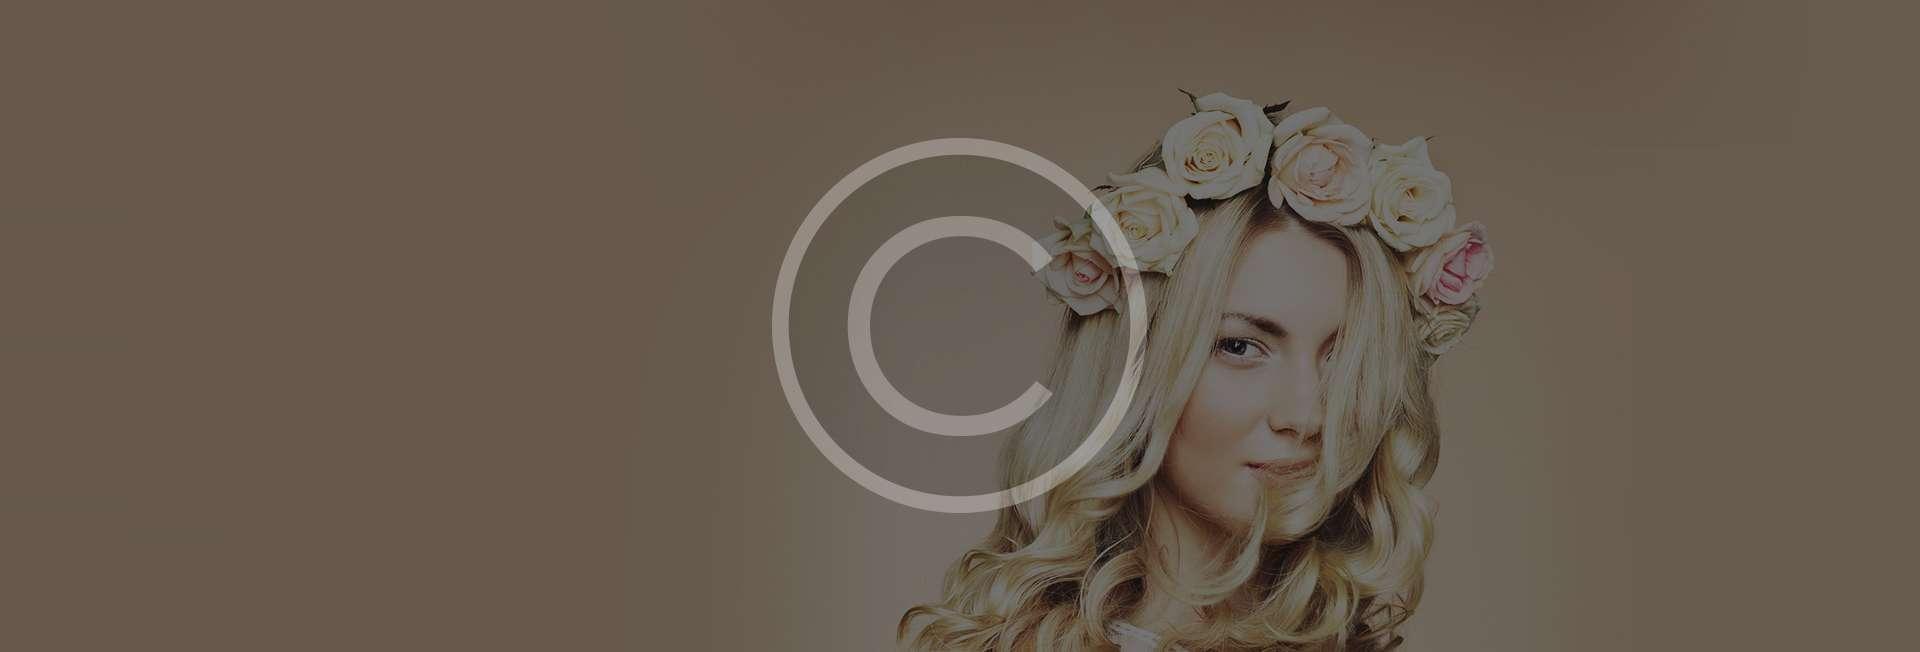 bigstock-Perfect-female-beauty-42325462.jpg